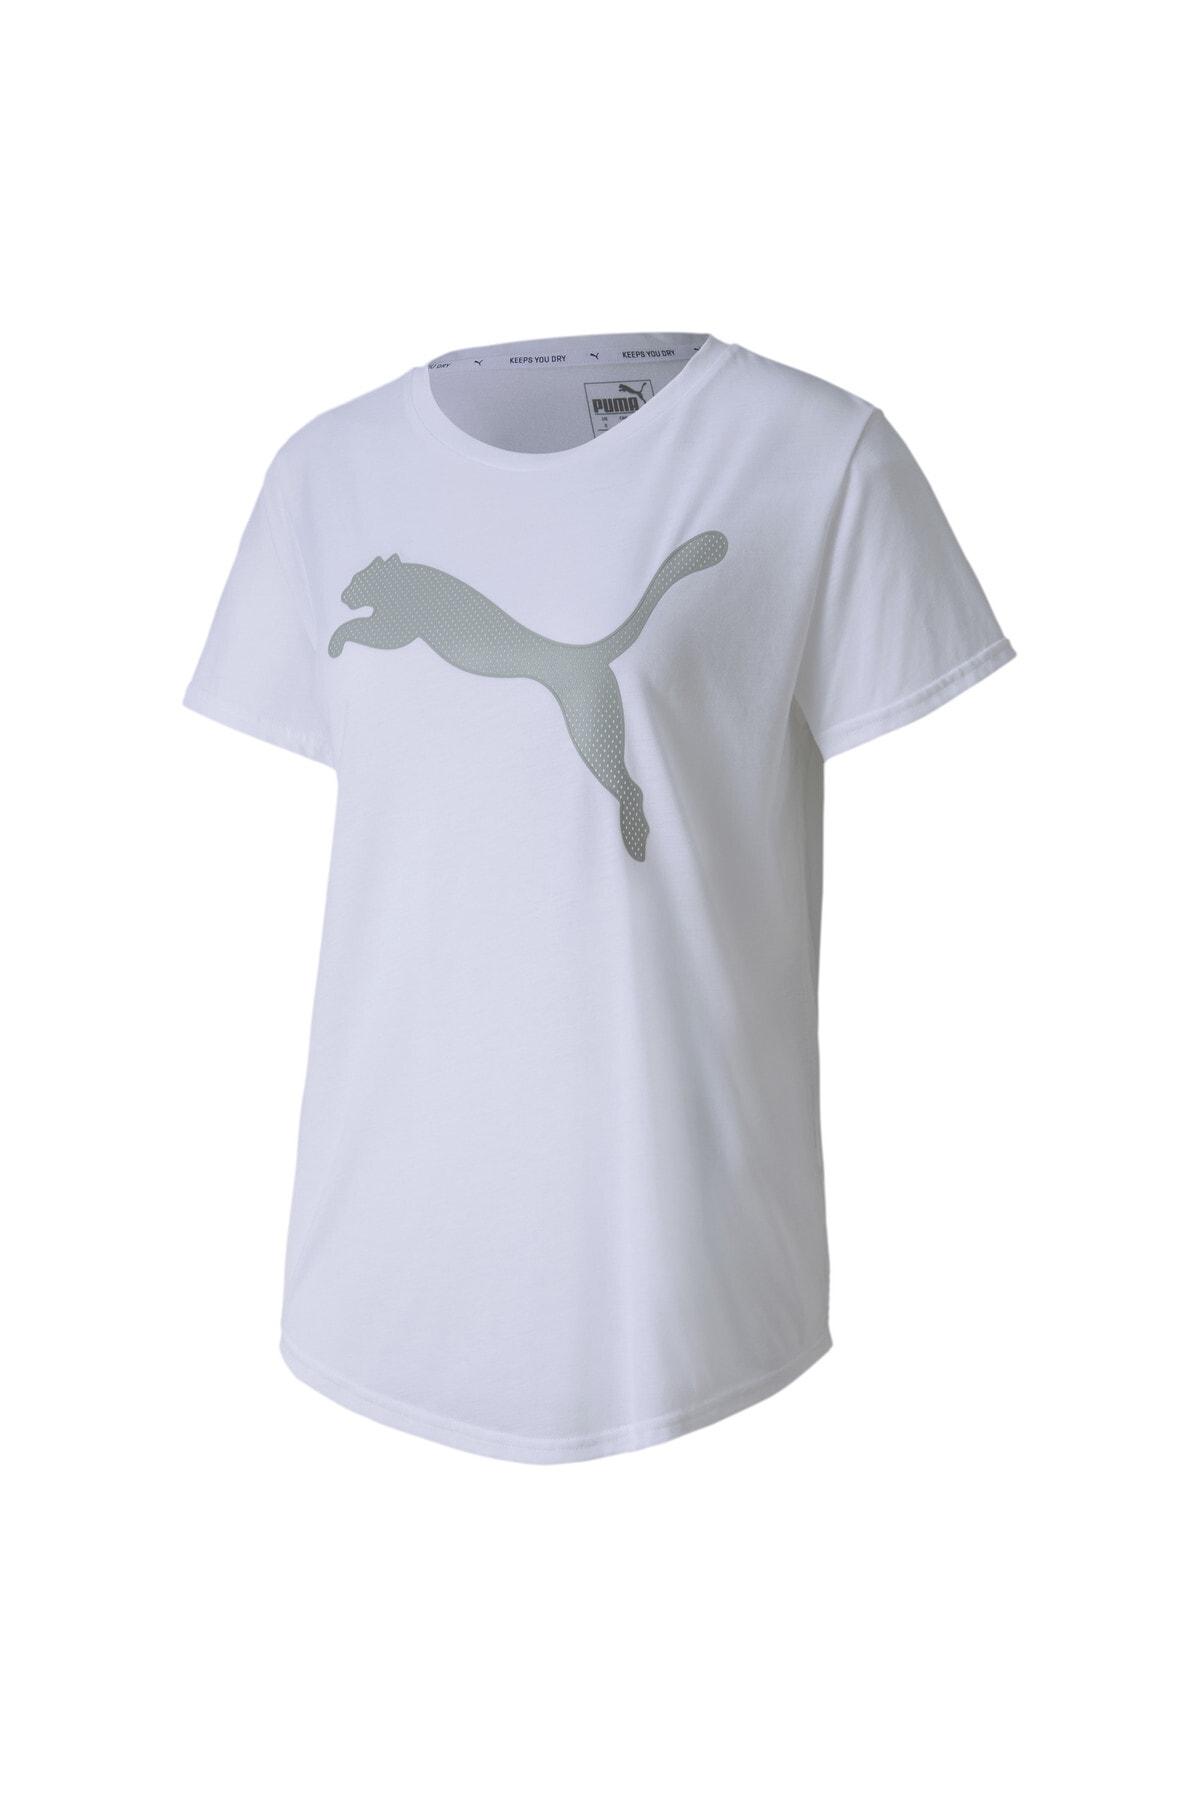 Puma Evostripe Kadın Tişört - 58124102 3